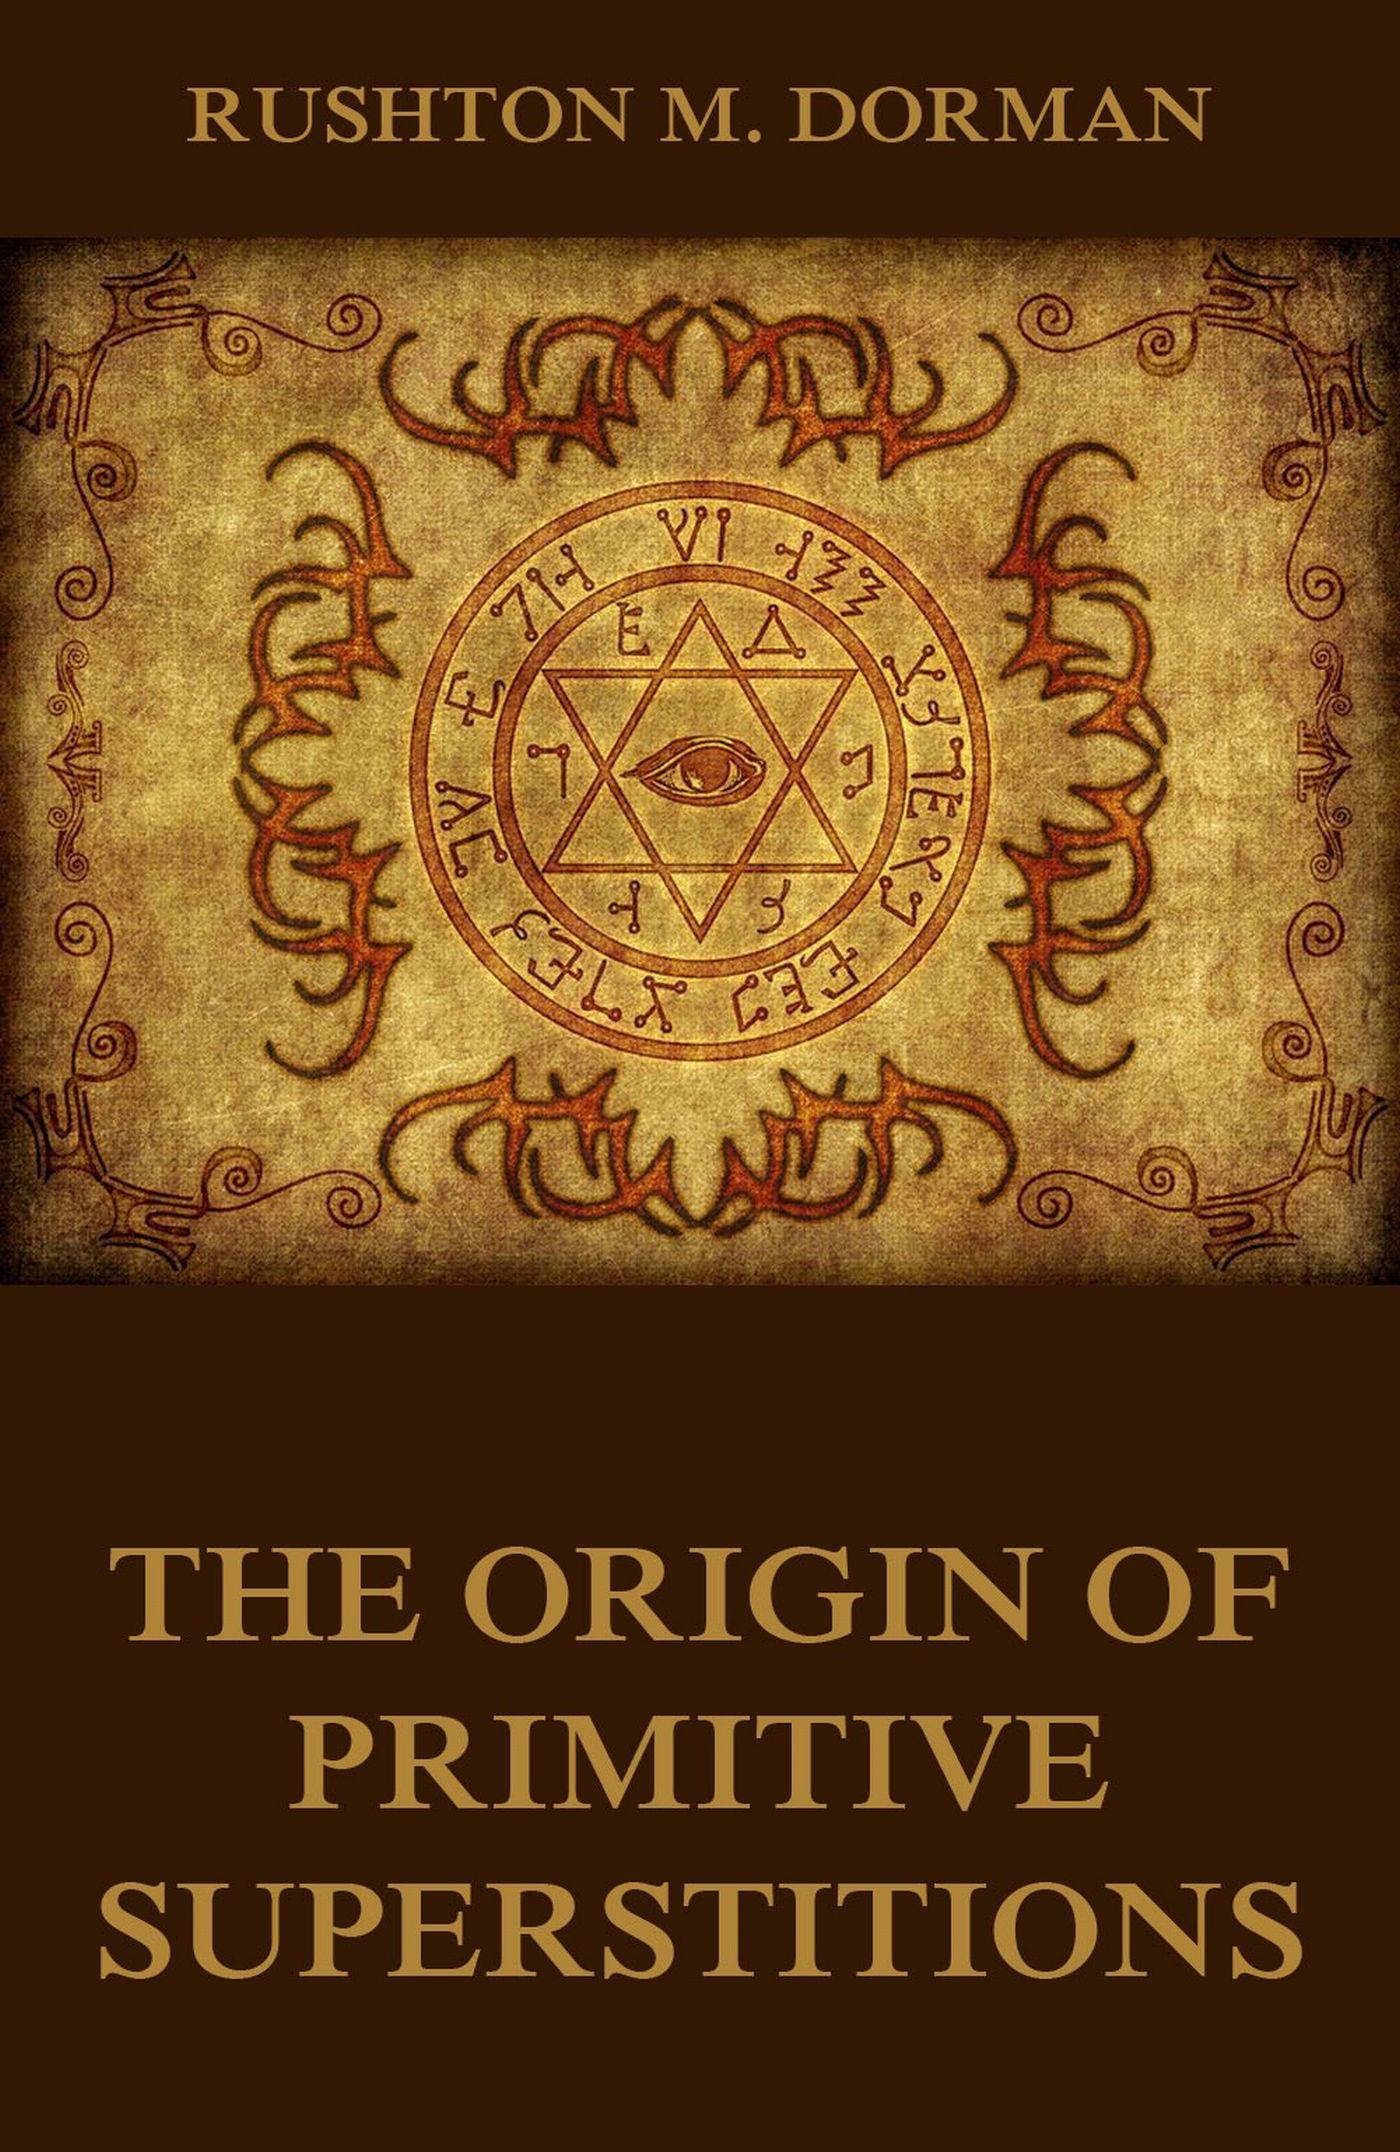 Rushton M. Dorman The Origin Of Primitive Superstitions hill bibliotheca primatologica development of the primitive streak